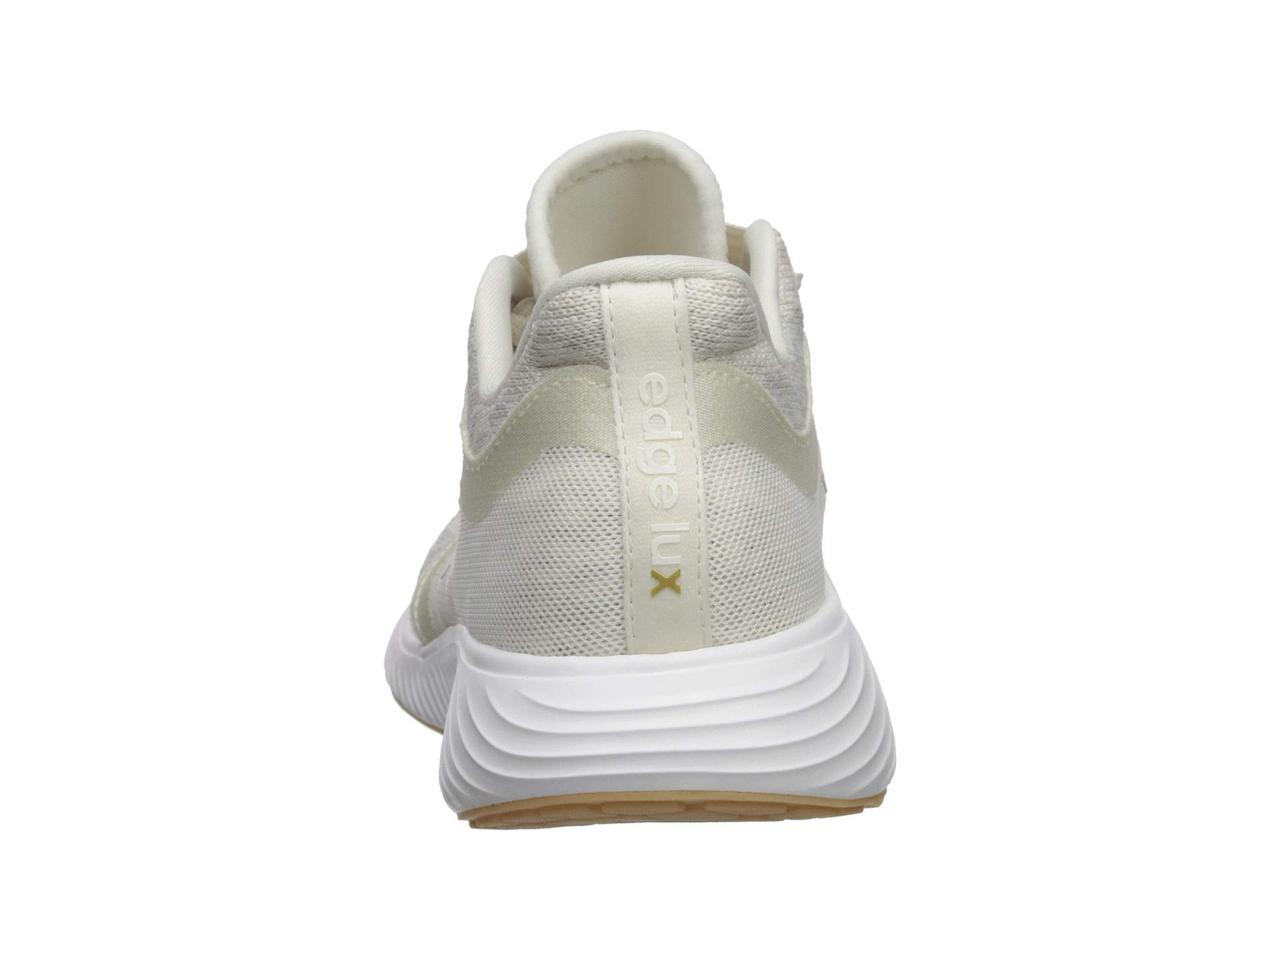 dddb4e473cb95 ... Кроссовки Кеды (Оригинал) adidas Running Edge Lux 3 Raw White Cloud  White ...